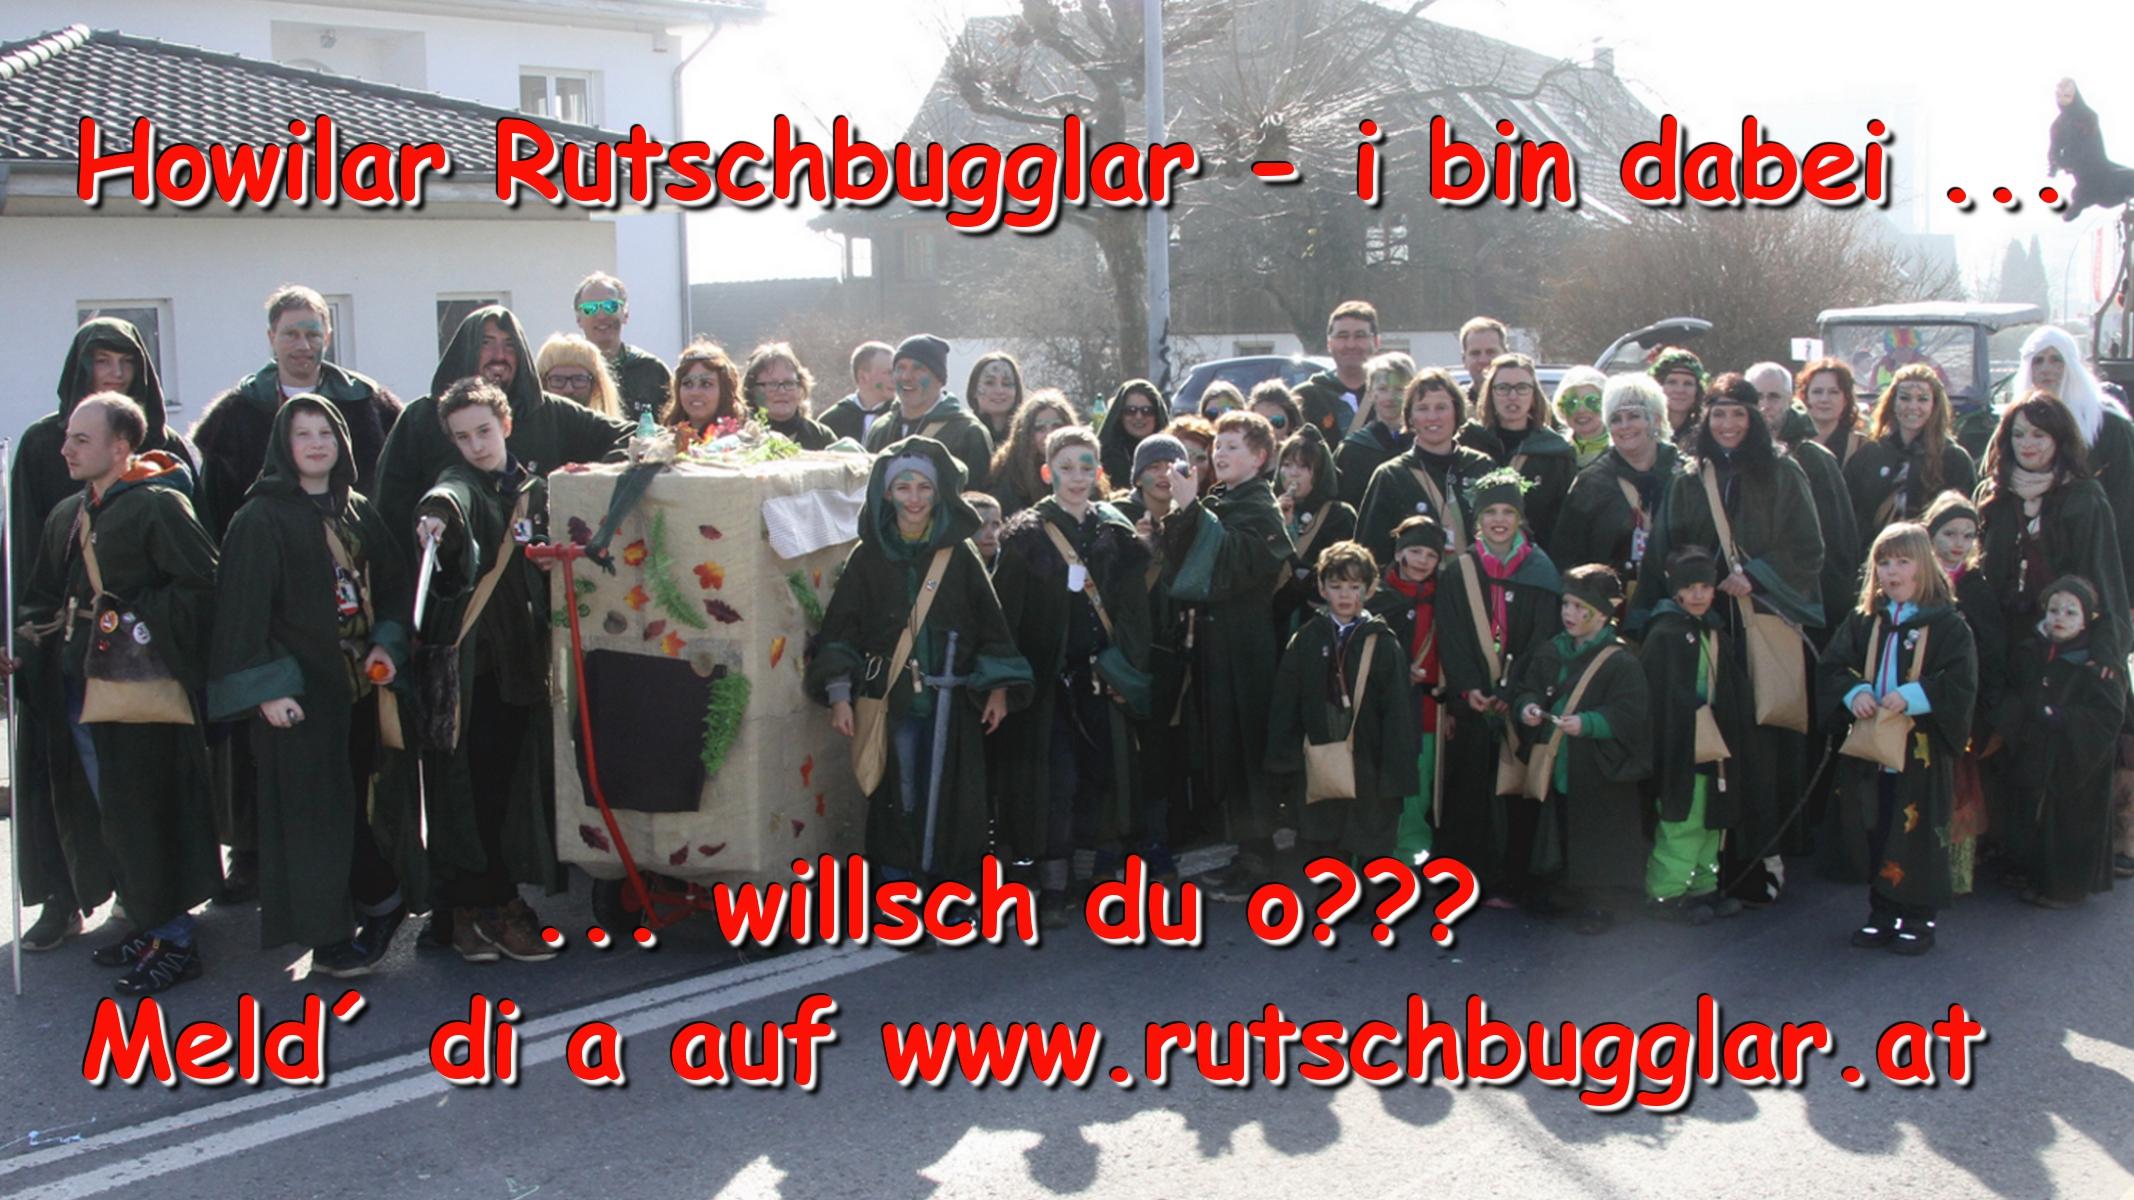 Rutschbugglar_Regional